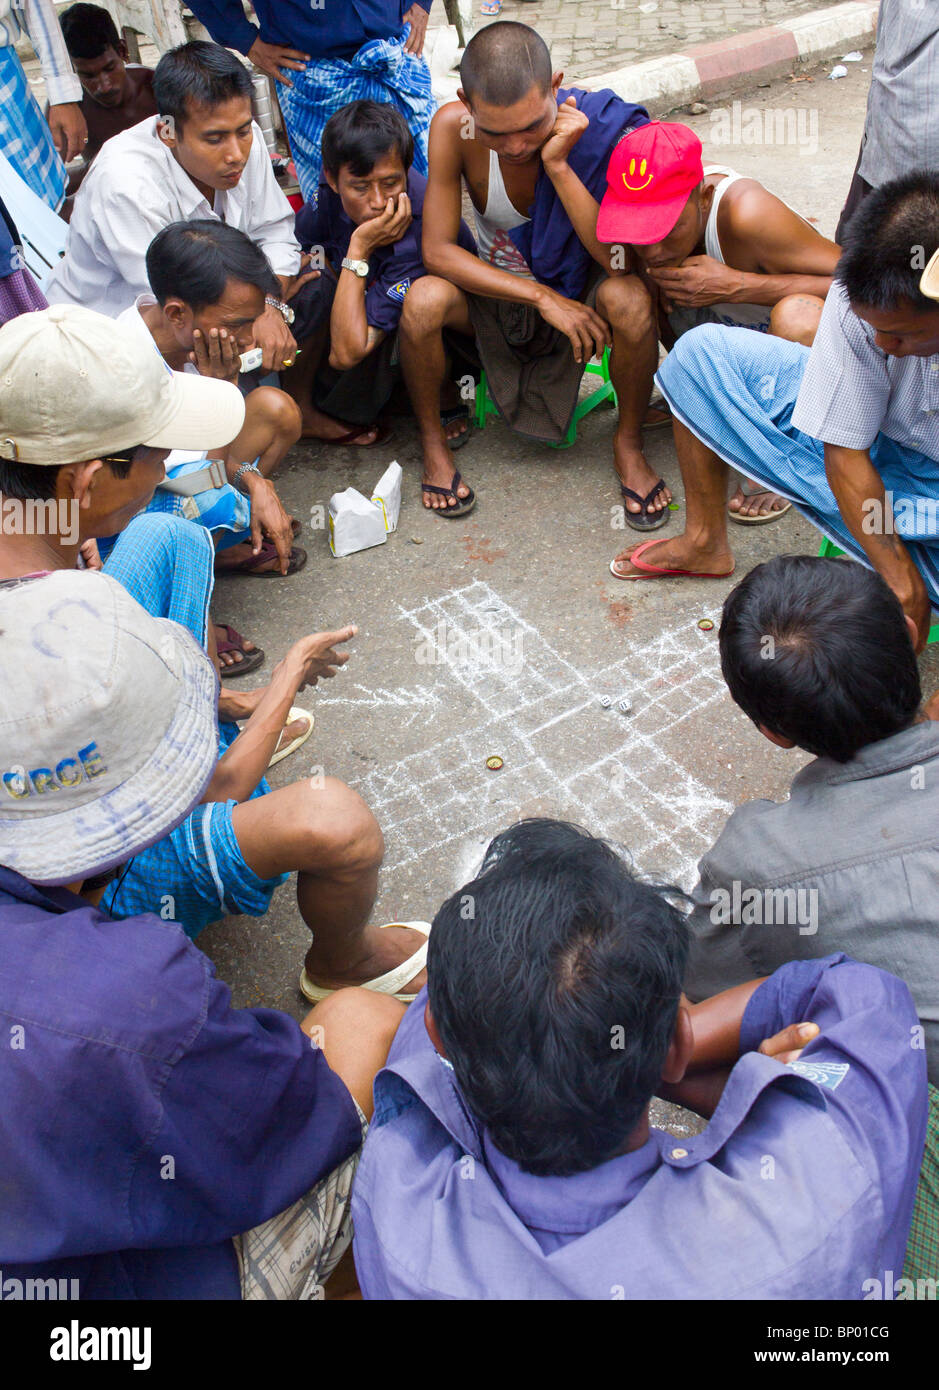 manual labourers playing gambling game, Yangon docks, Myanmar - Stock Image